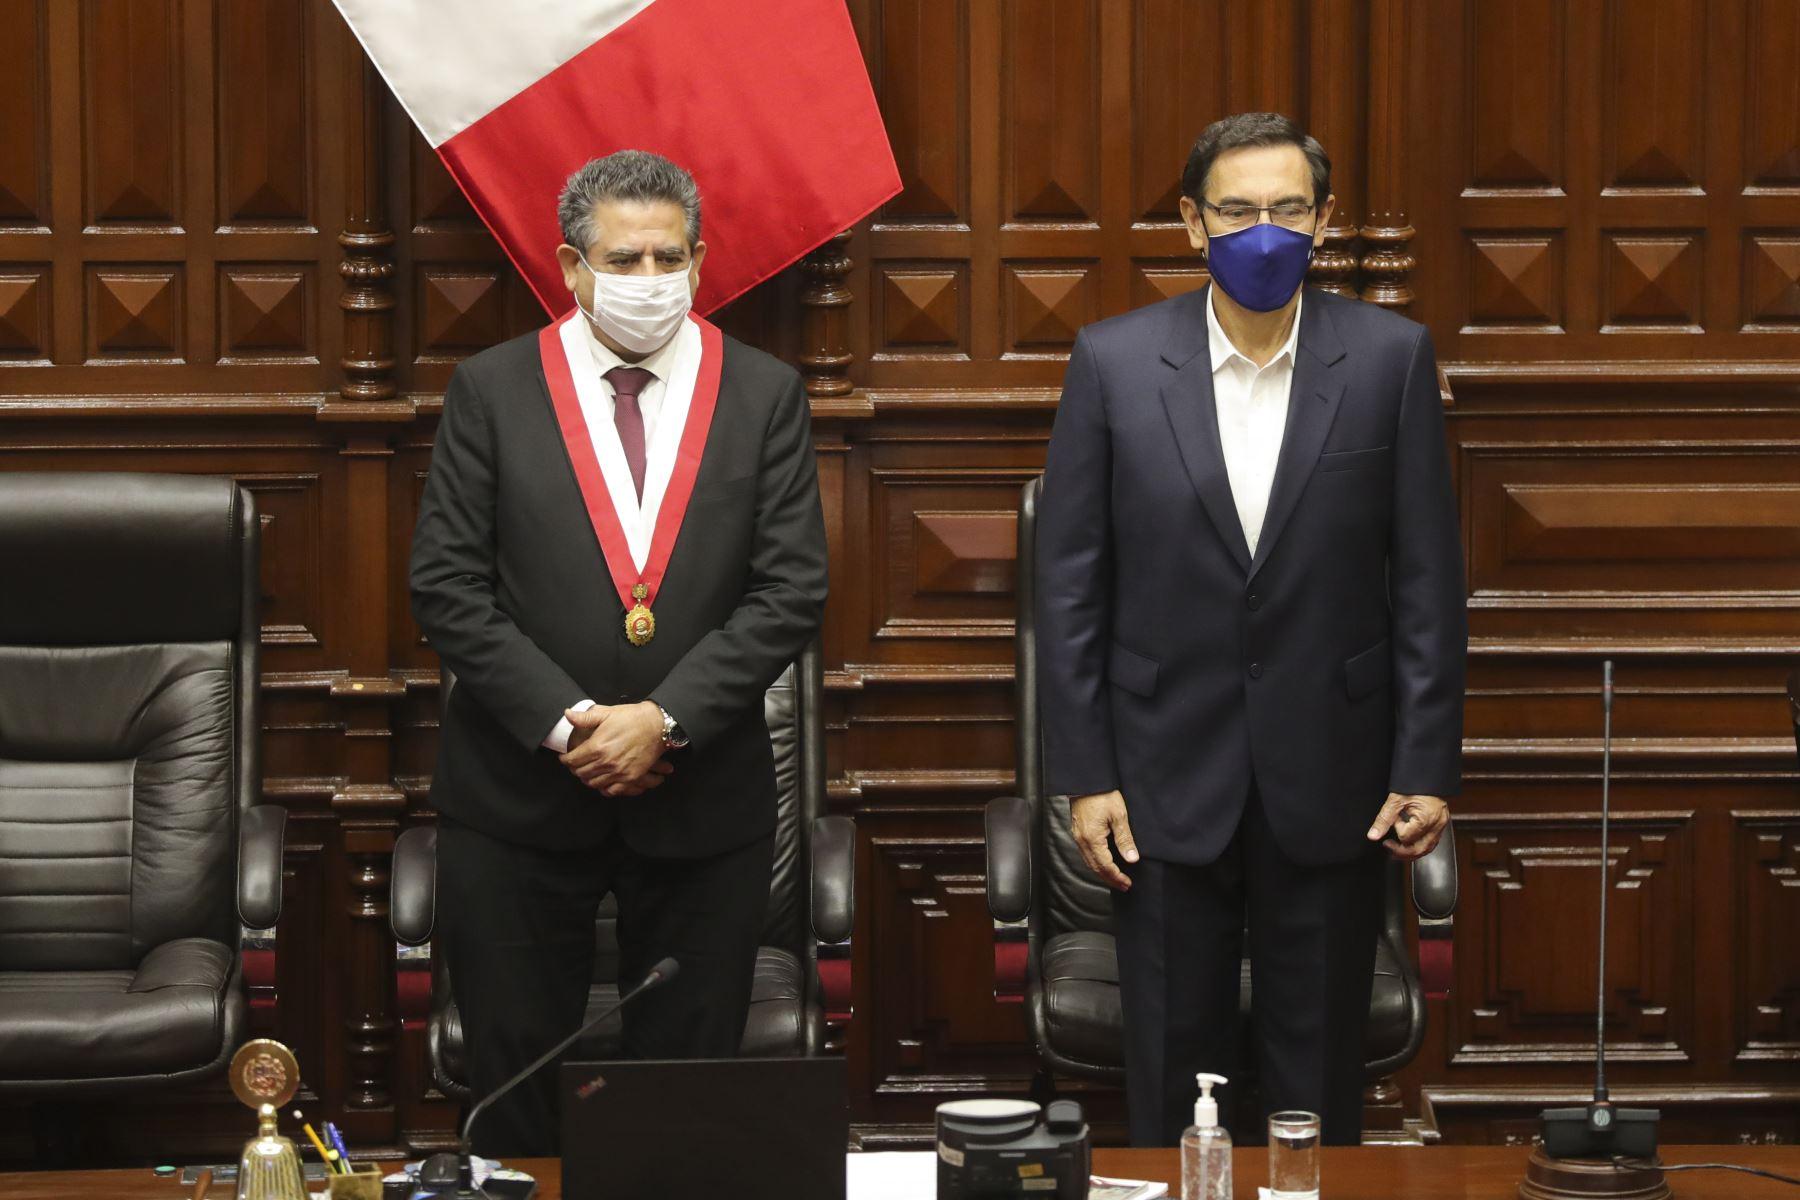 Presidente Vizcarra confirma reunión con titular del Congreso este lunes